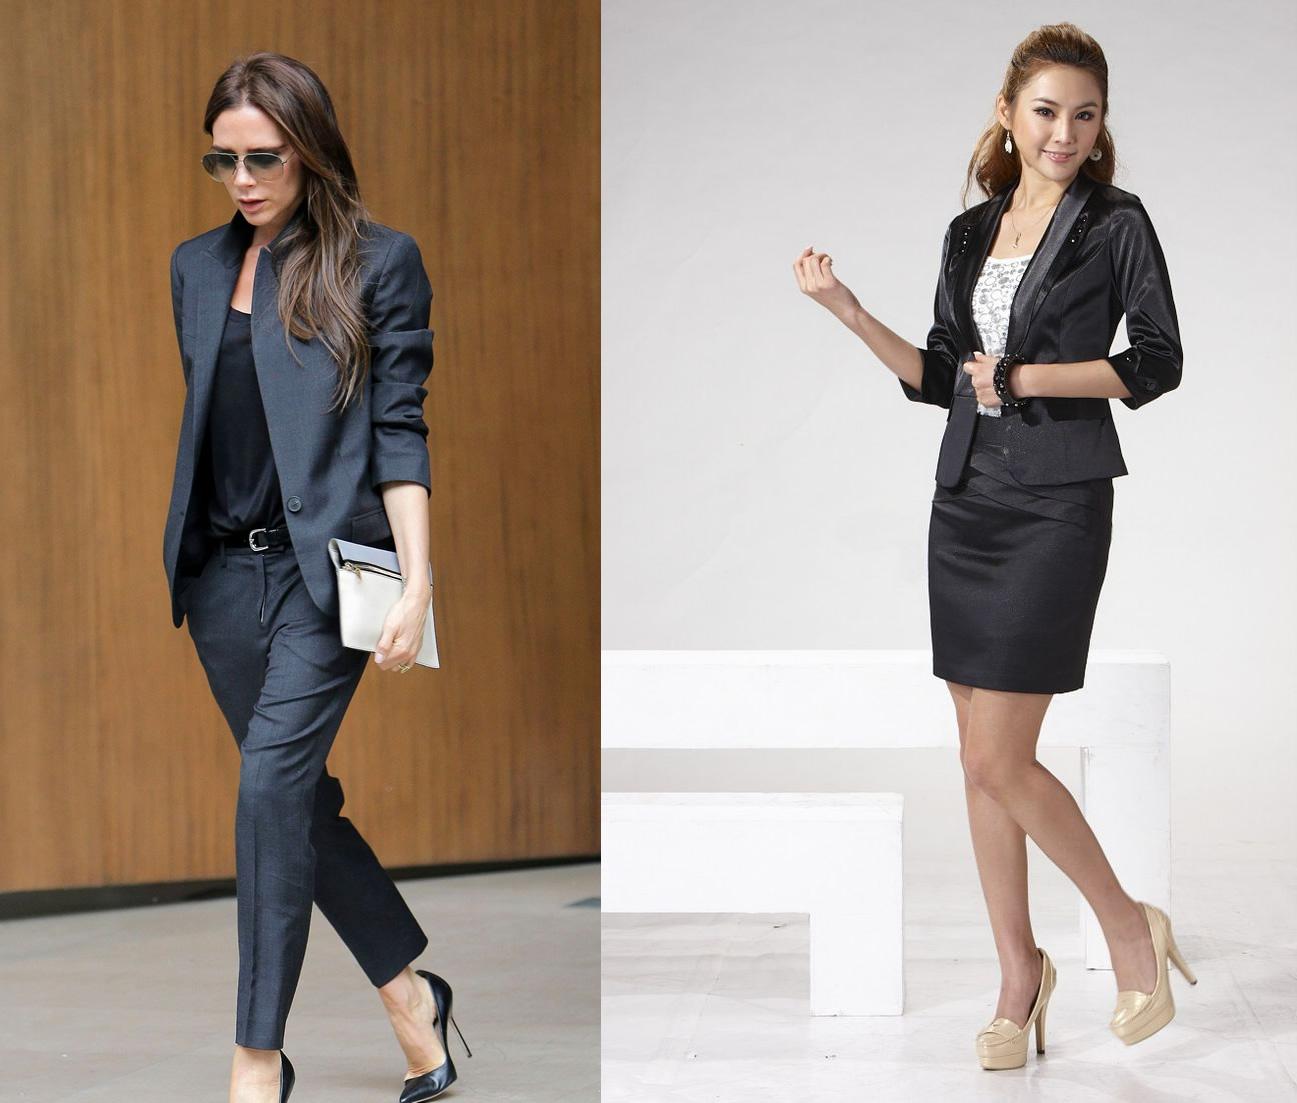 10 Ladylike Ways to Wear a Suit: Women Work Fashion - FMag.com